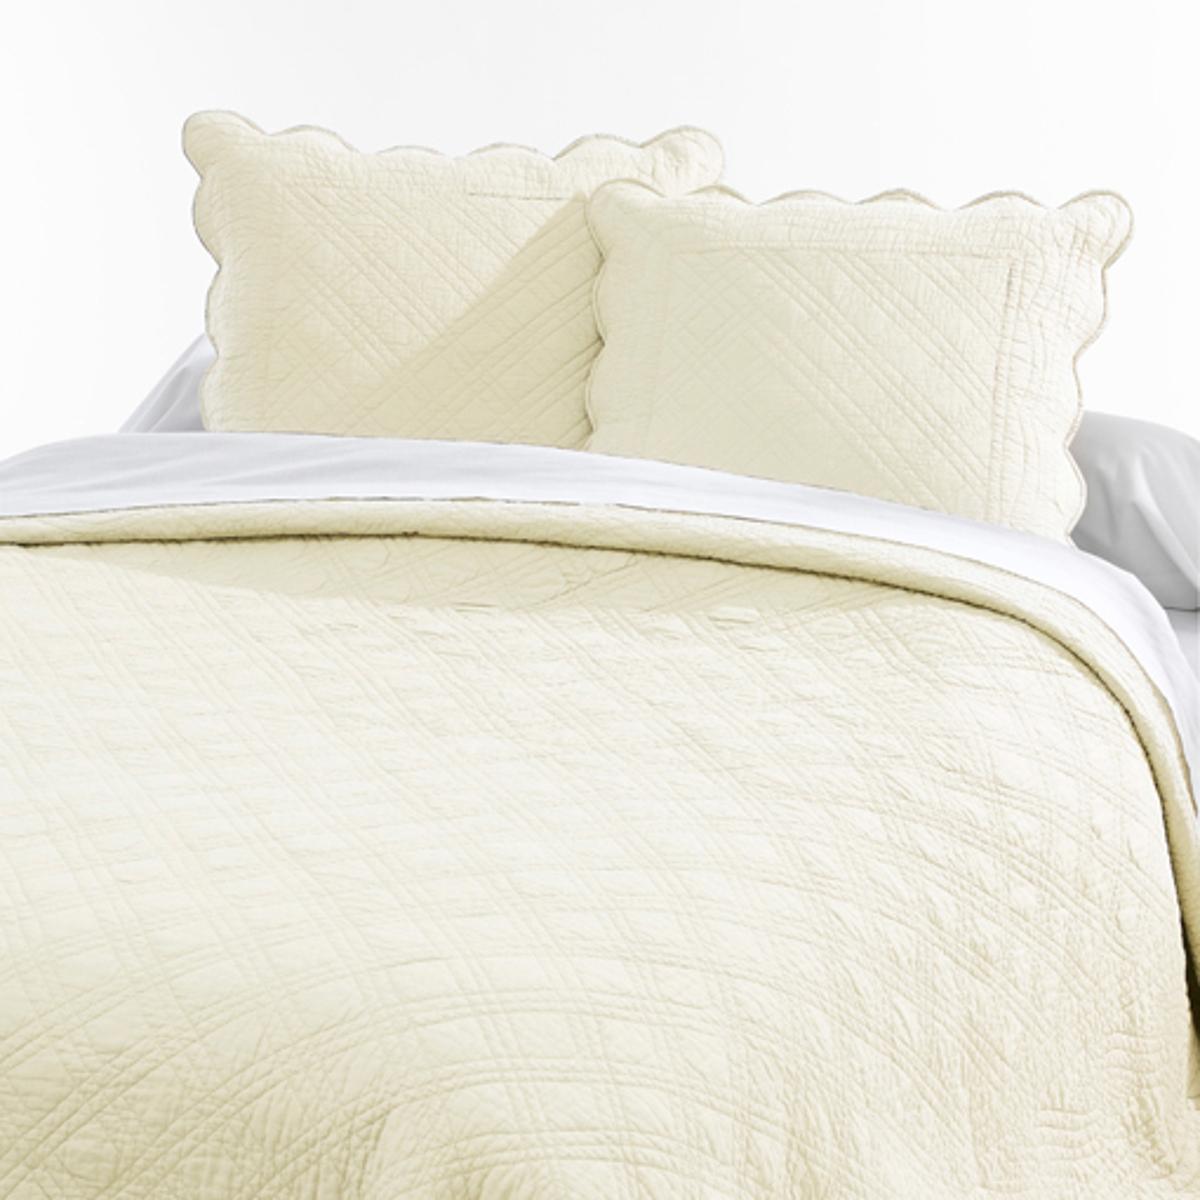 Чехол для подушки от La Redoute